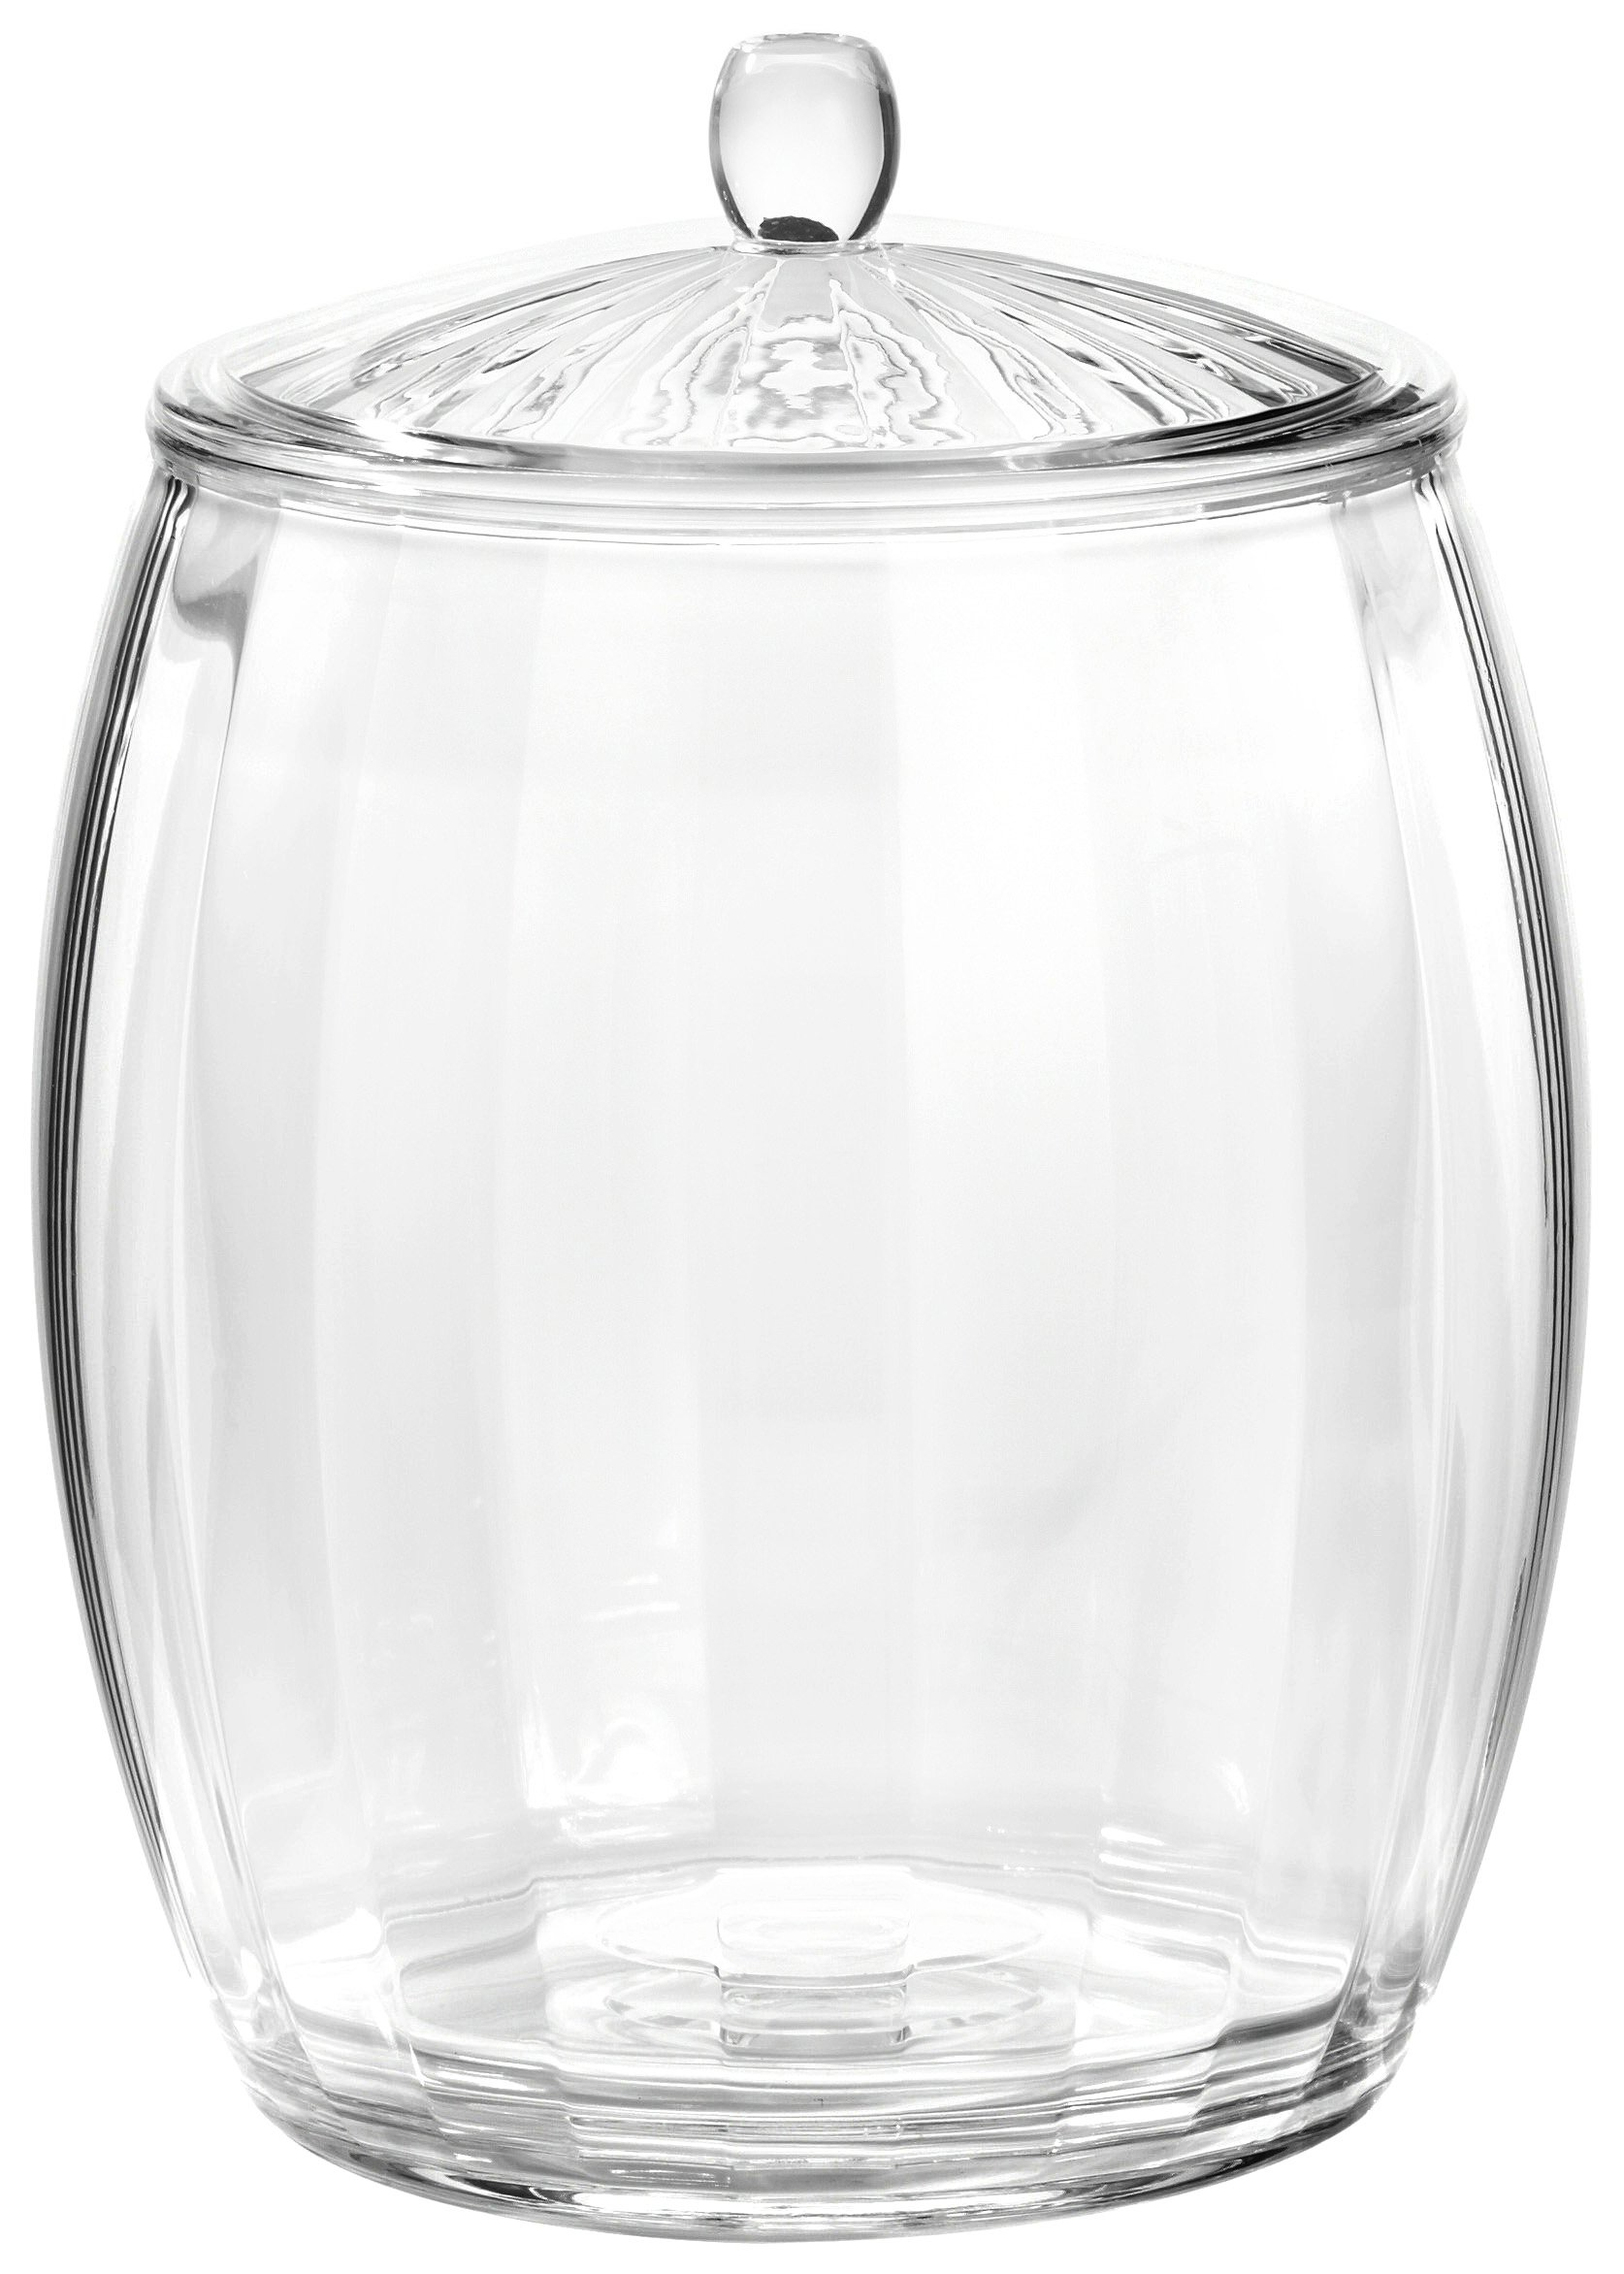 Prodyne AP-98 Contours 3-1/2-Quart Ice Bucket, Clear